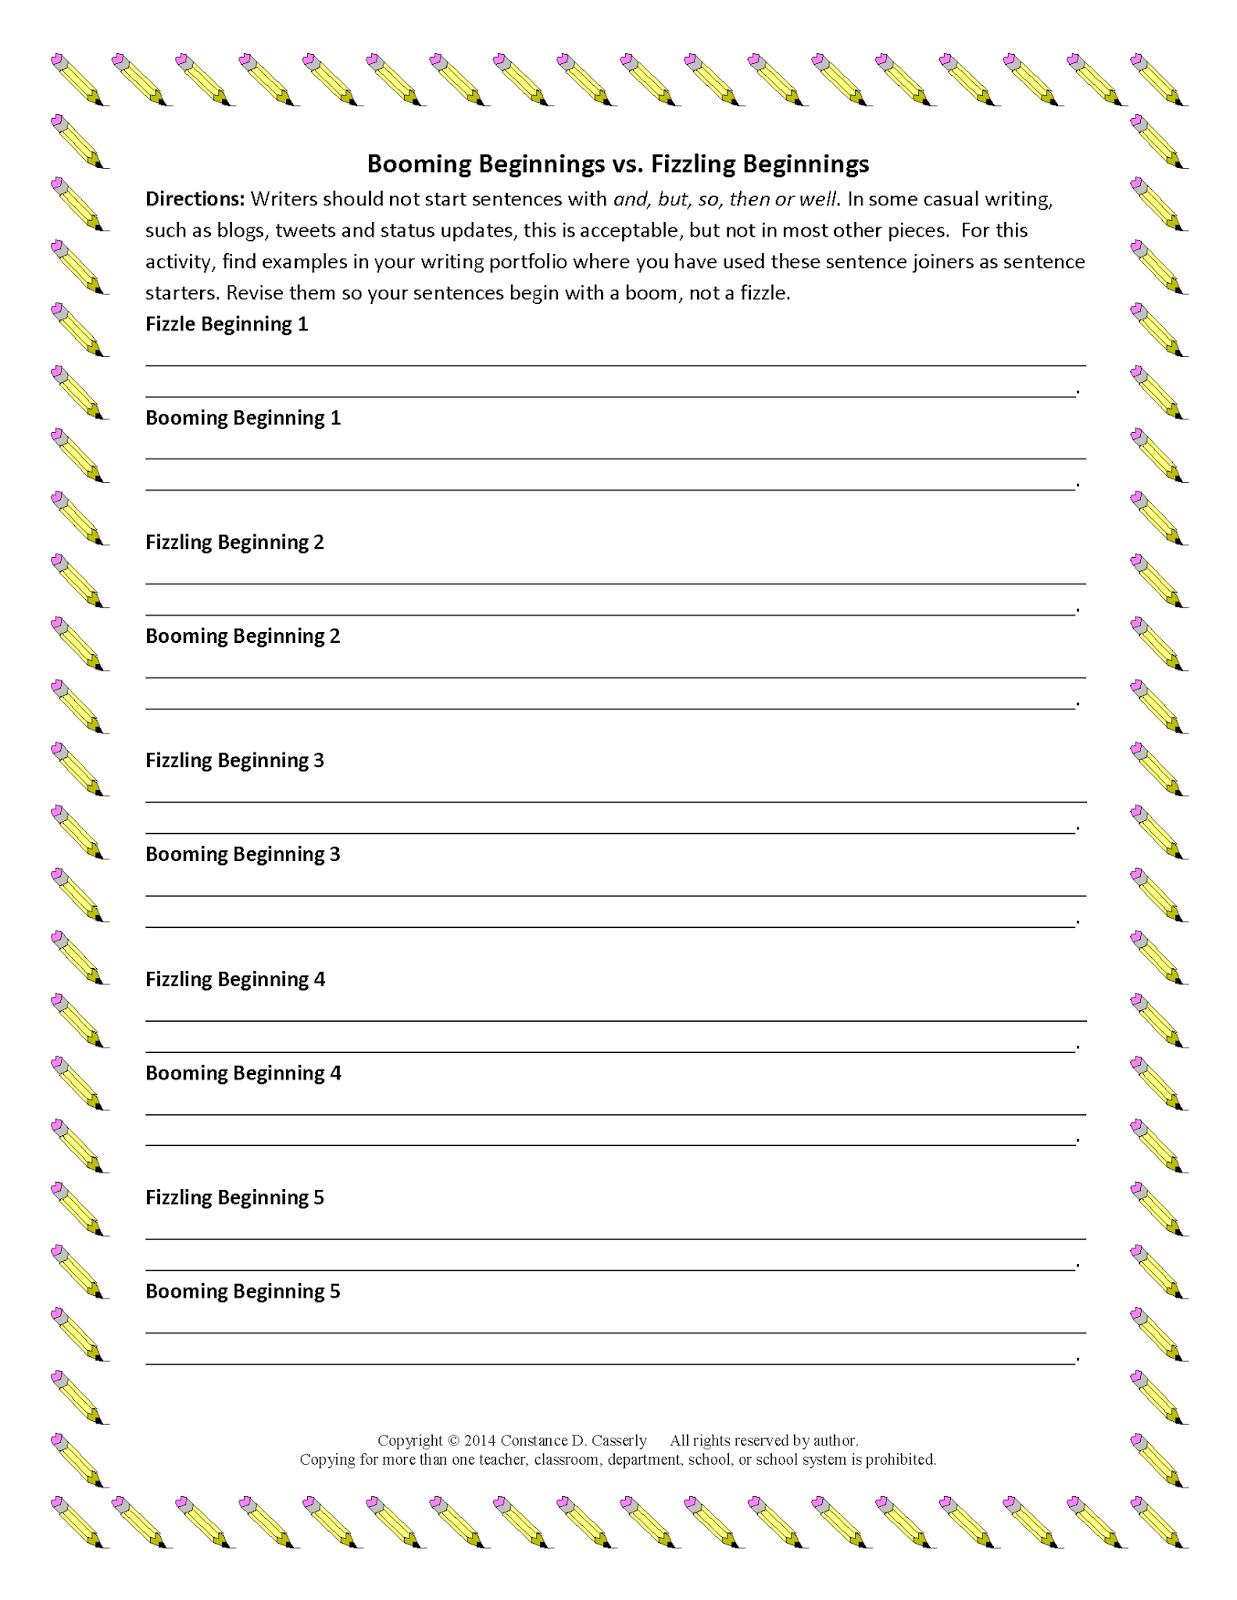 essay writing sentence starters sentence starters for argumentative essays dailynewsreport sentence starters for argumentative essays dailynewsreport